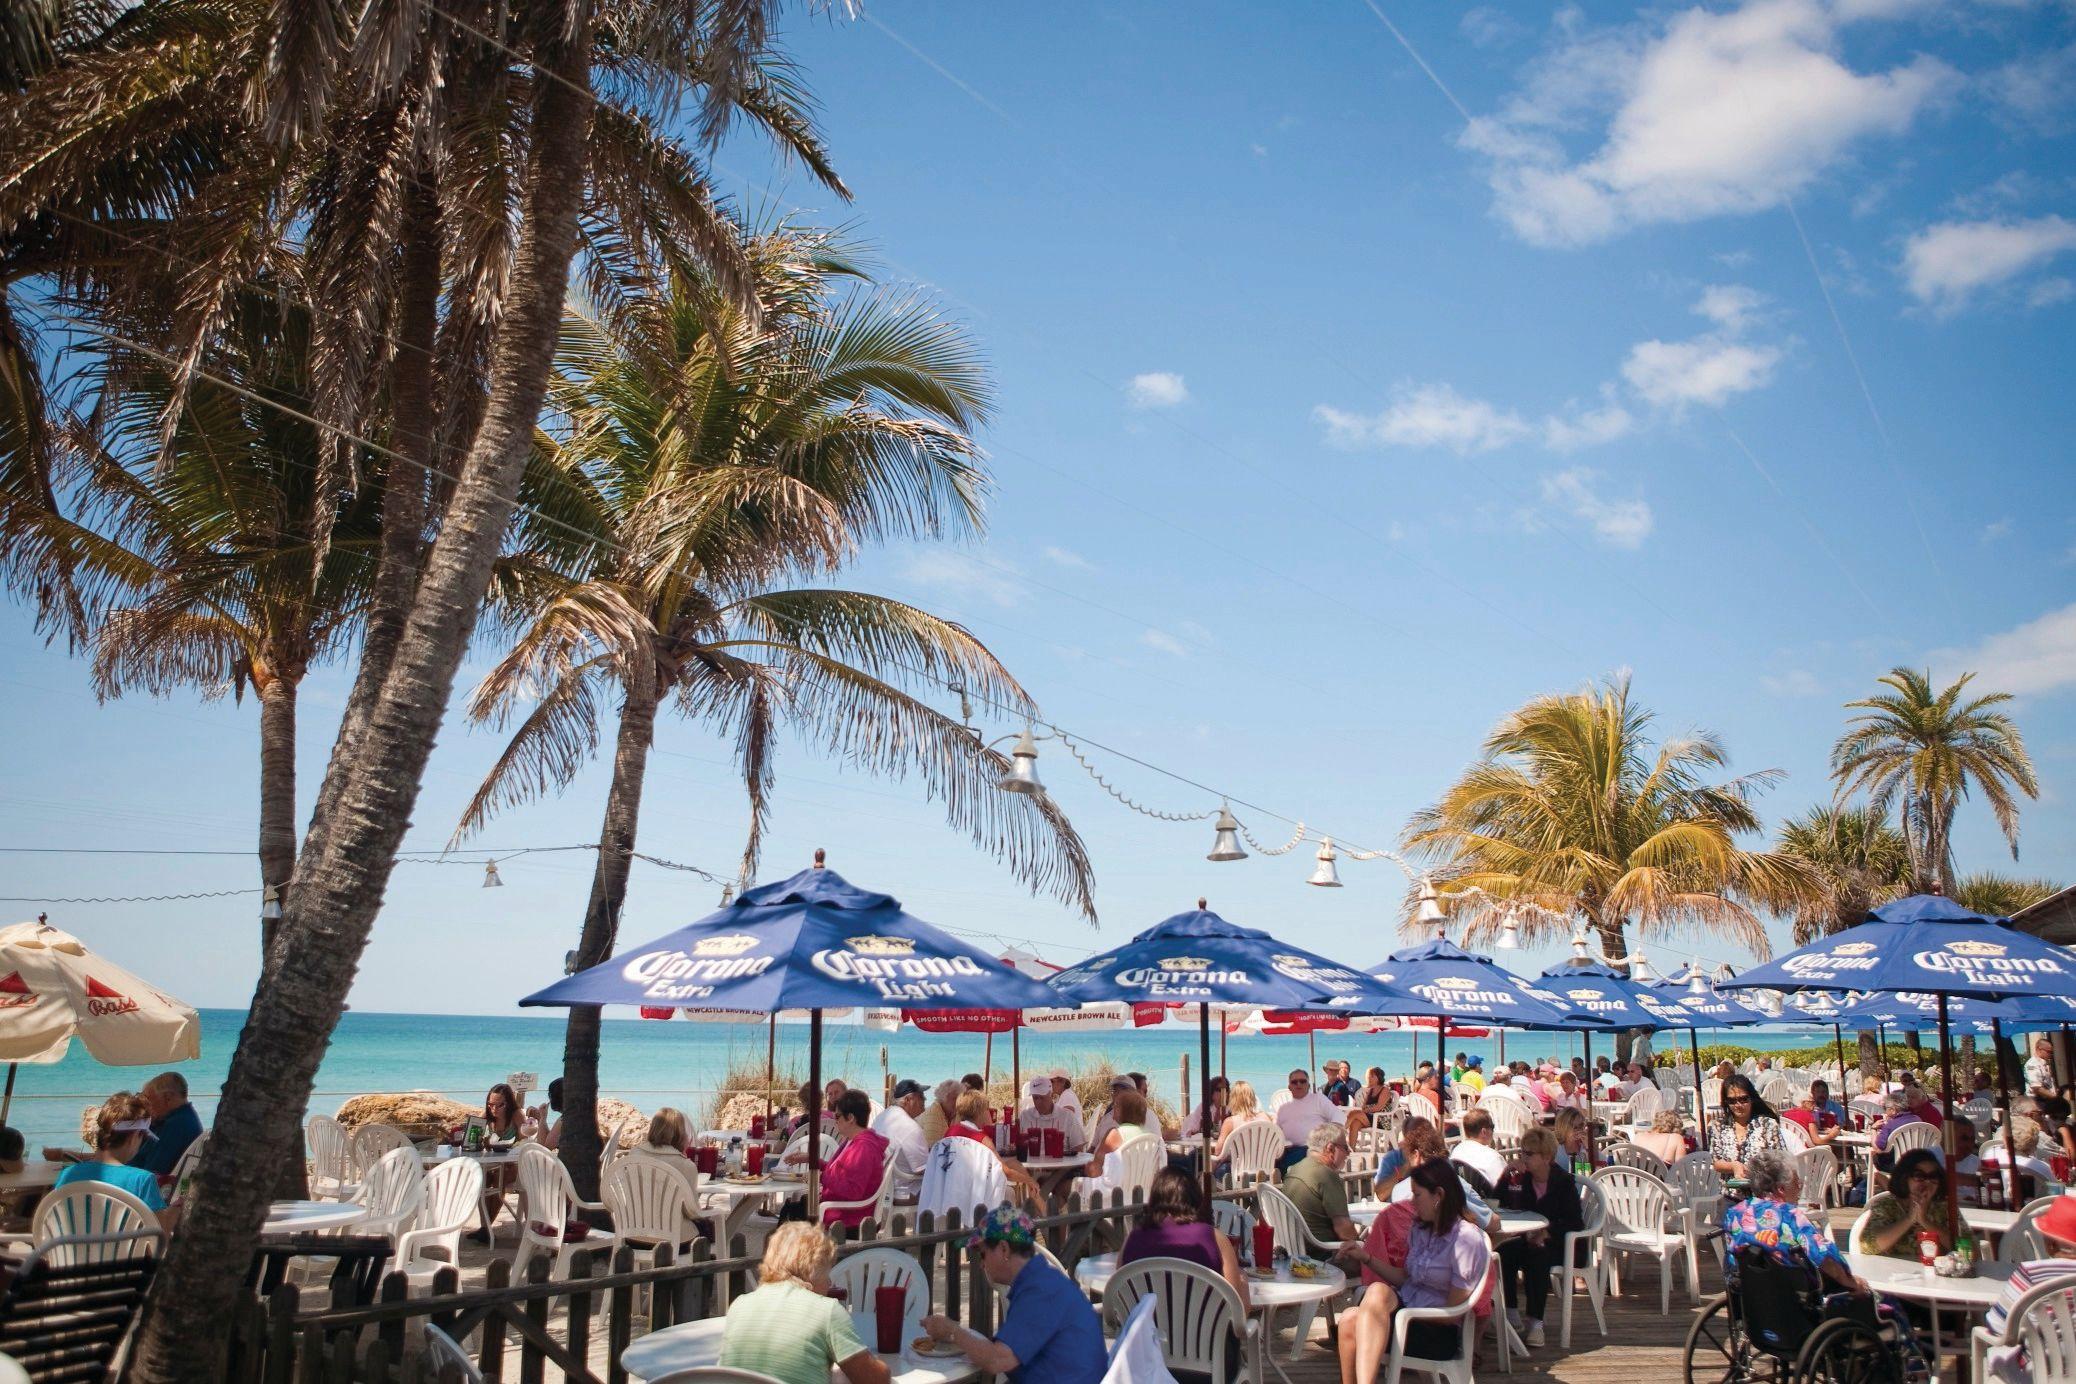 Beachhouse restaurant   ami sdo21hq39nu740tjmgwpa5s18q0ablzbh cmyk s waef4n